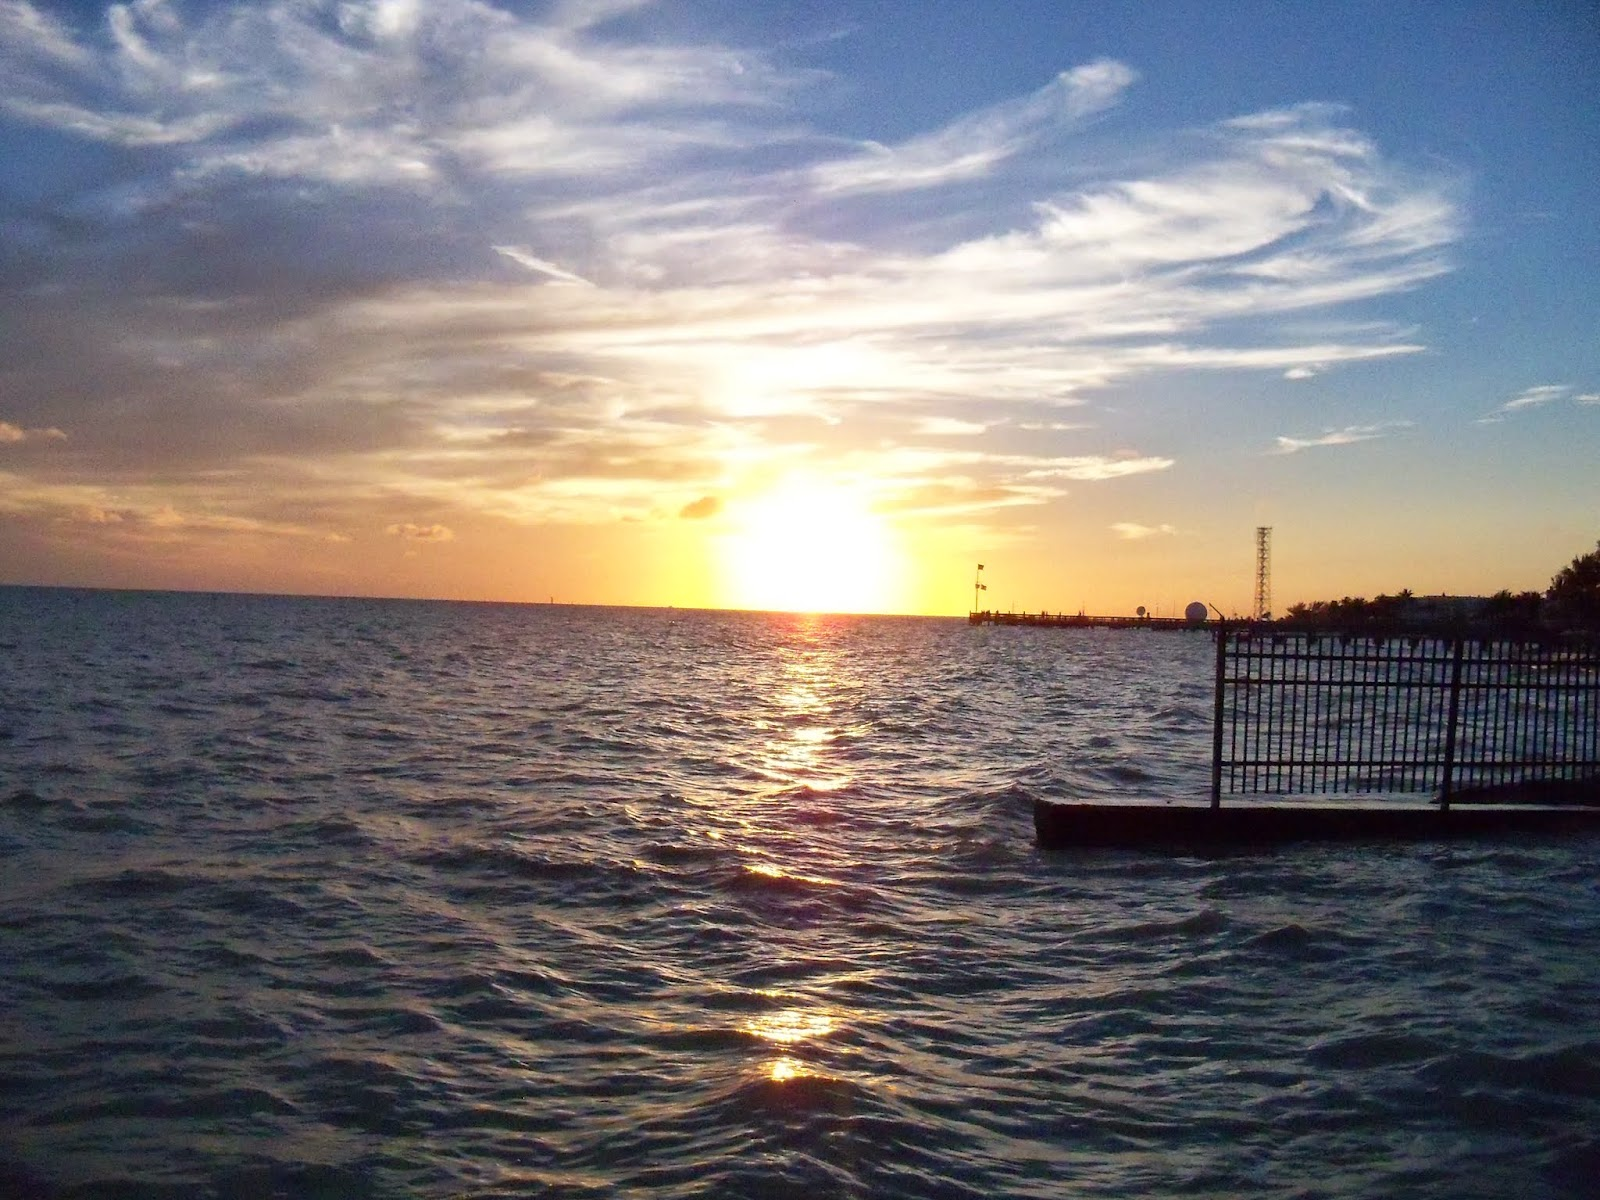 Key West Vacation - 116_5572.JPG